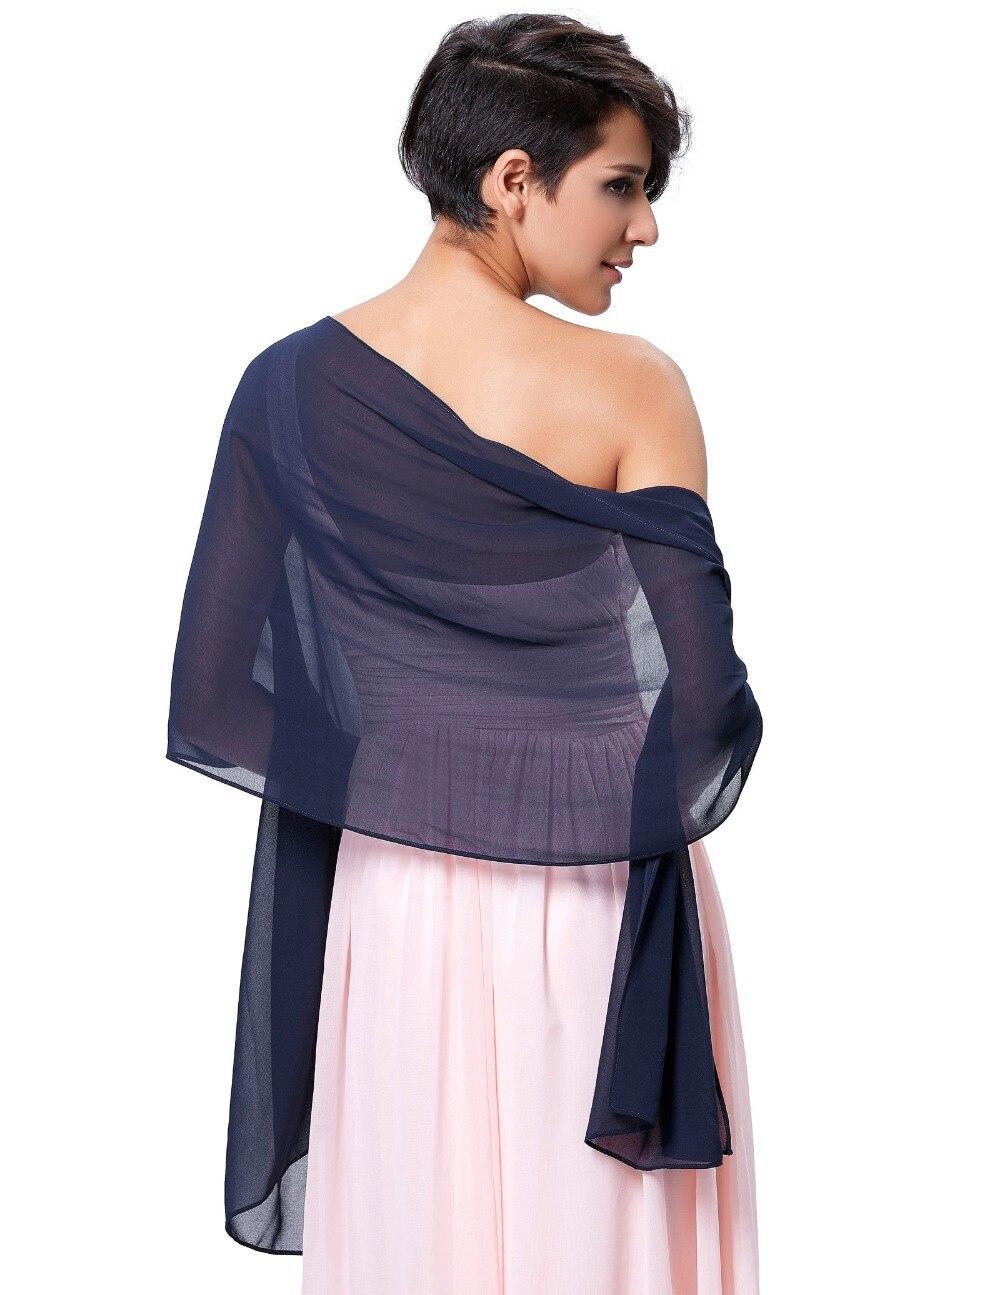 2018 bufanda de moda chal Hijab verano Popular pura chales bufandas para mujeres Cachecol Femme gasa bufanda chal azul púrpura